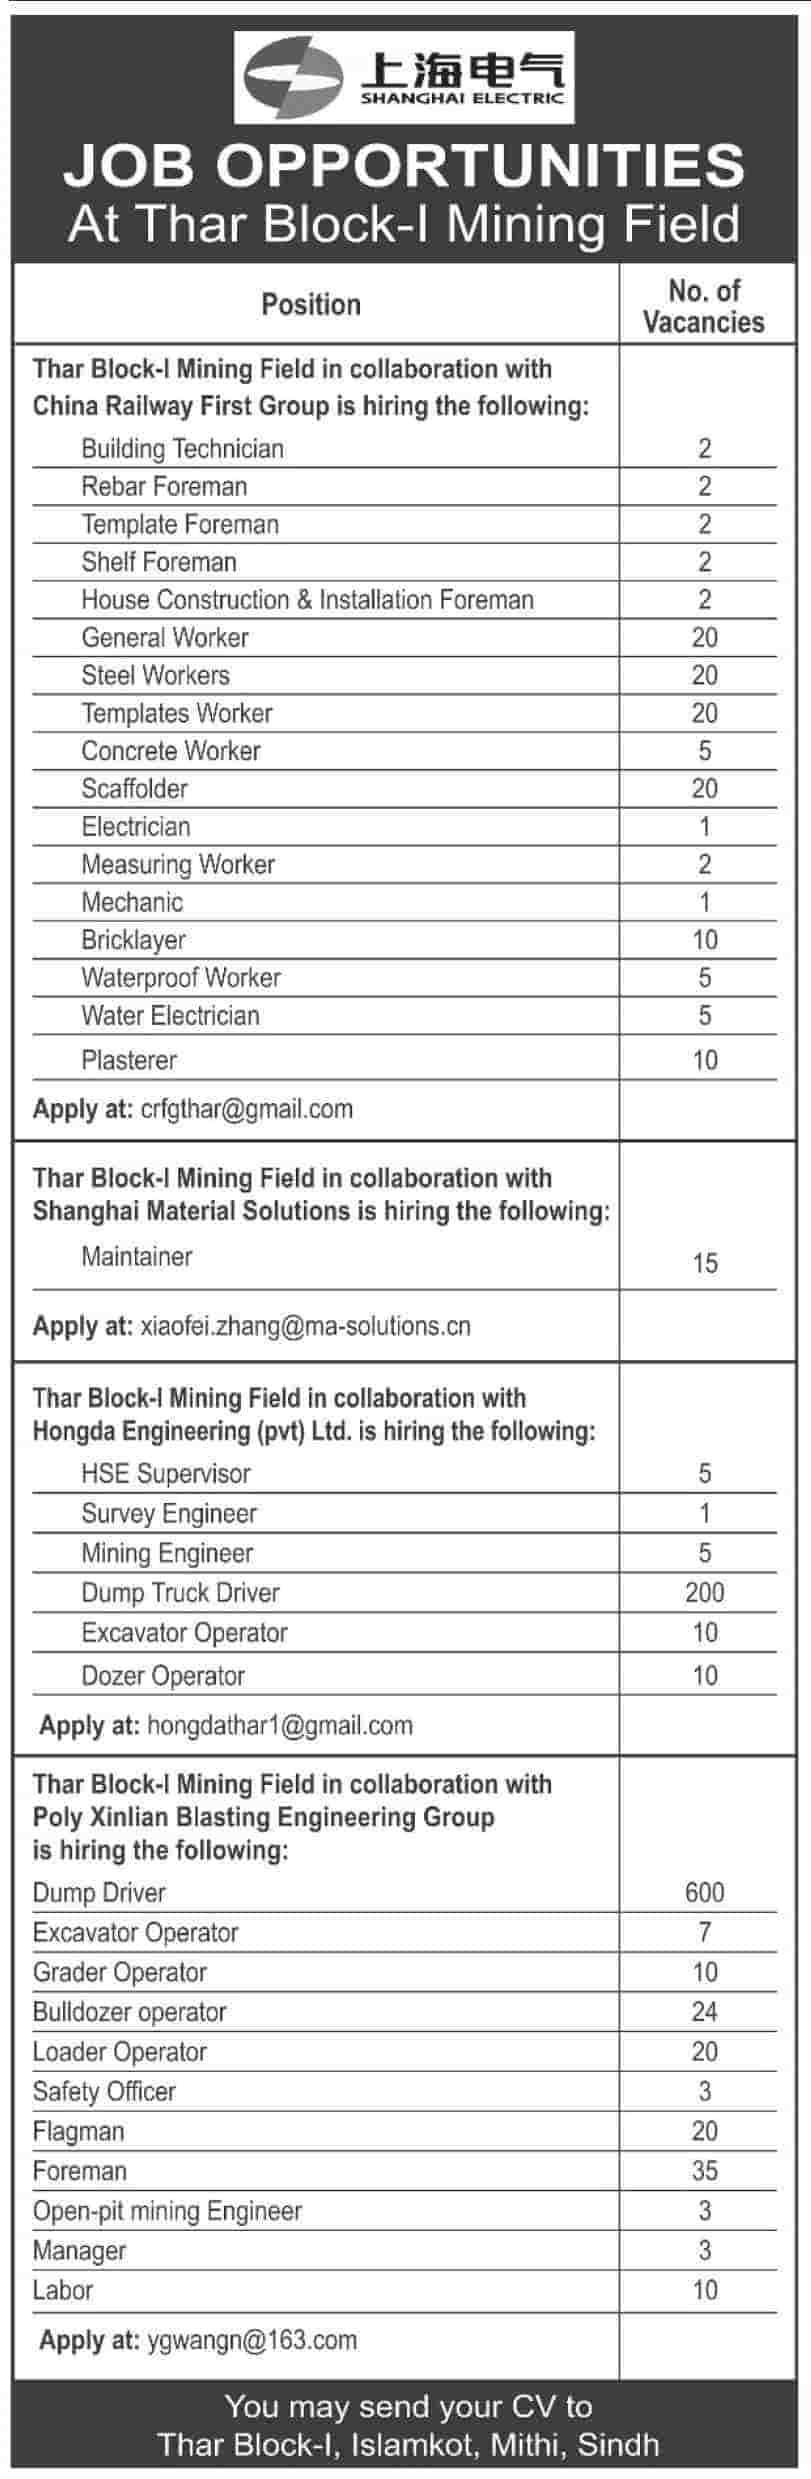 Shanghai Electric Jobs August 2020 Advertisement